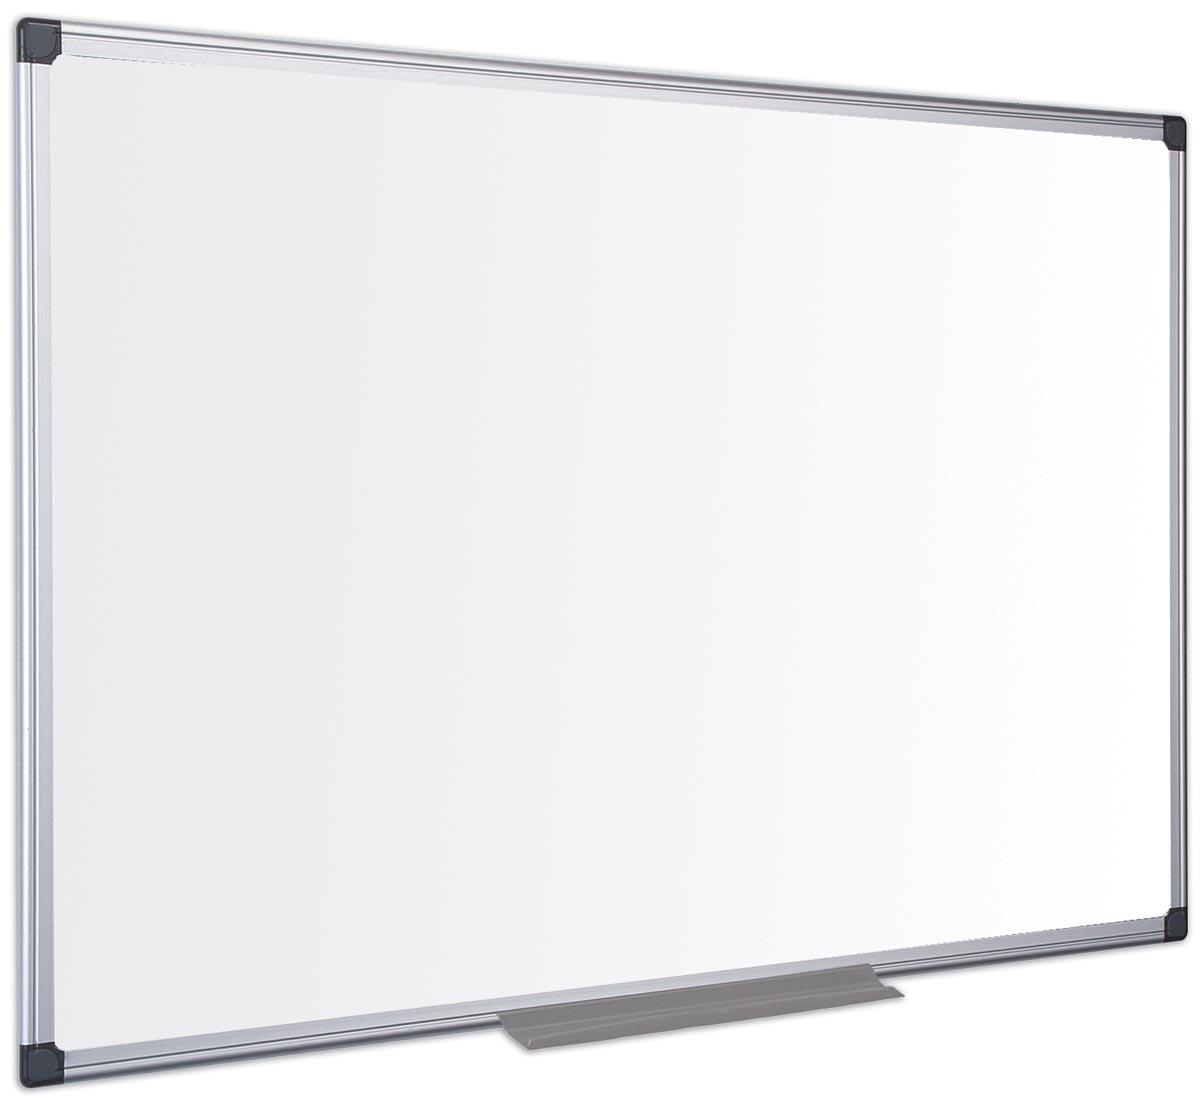 5 Star magnetisch emaille whiteboard ft 60 x 45 cm